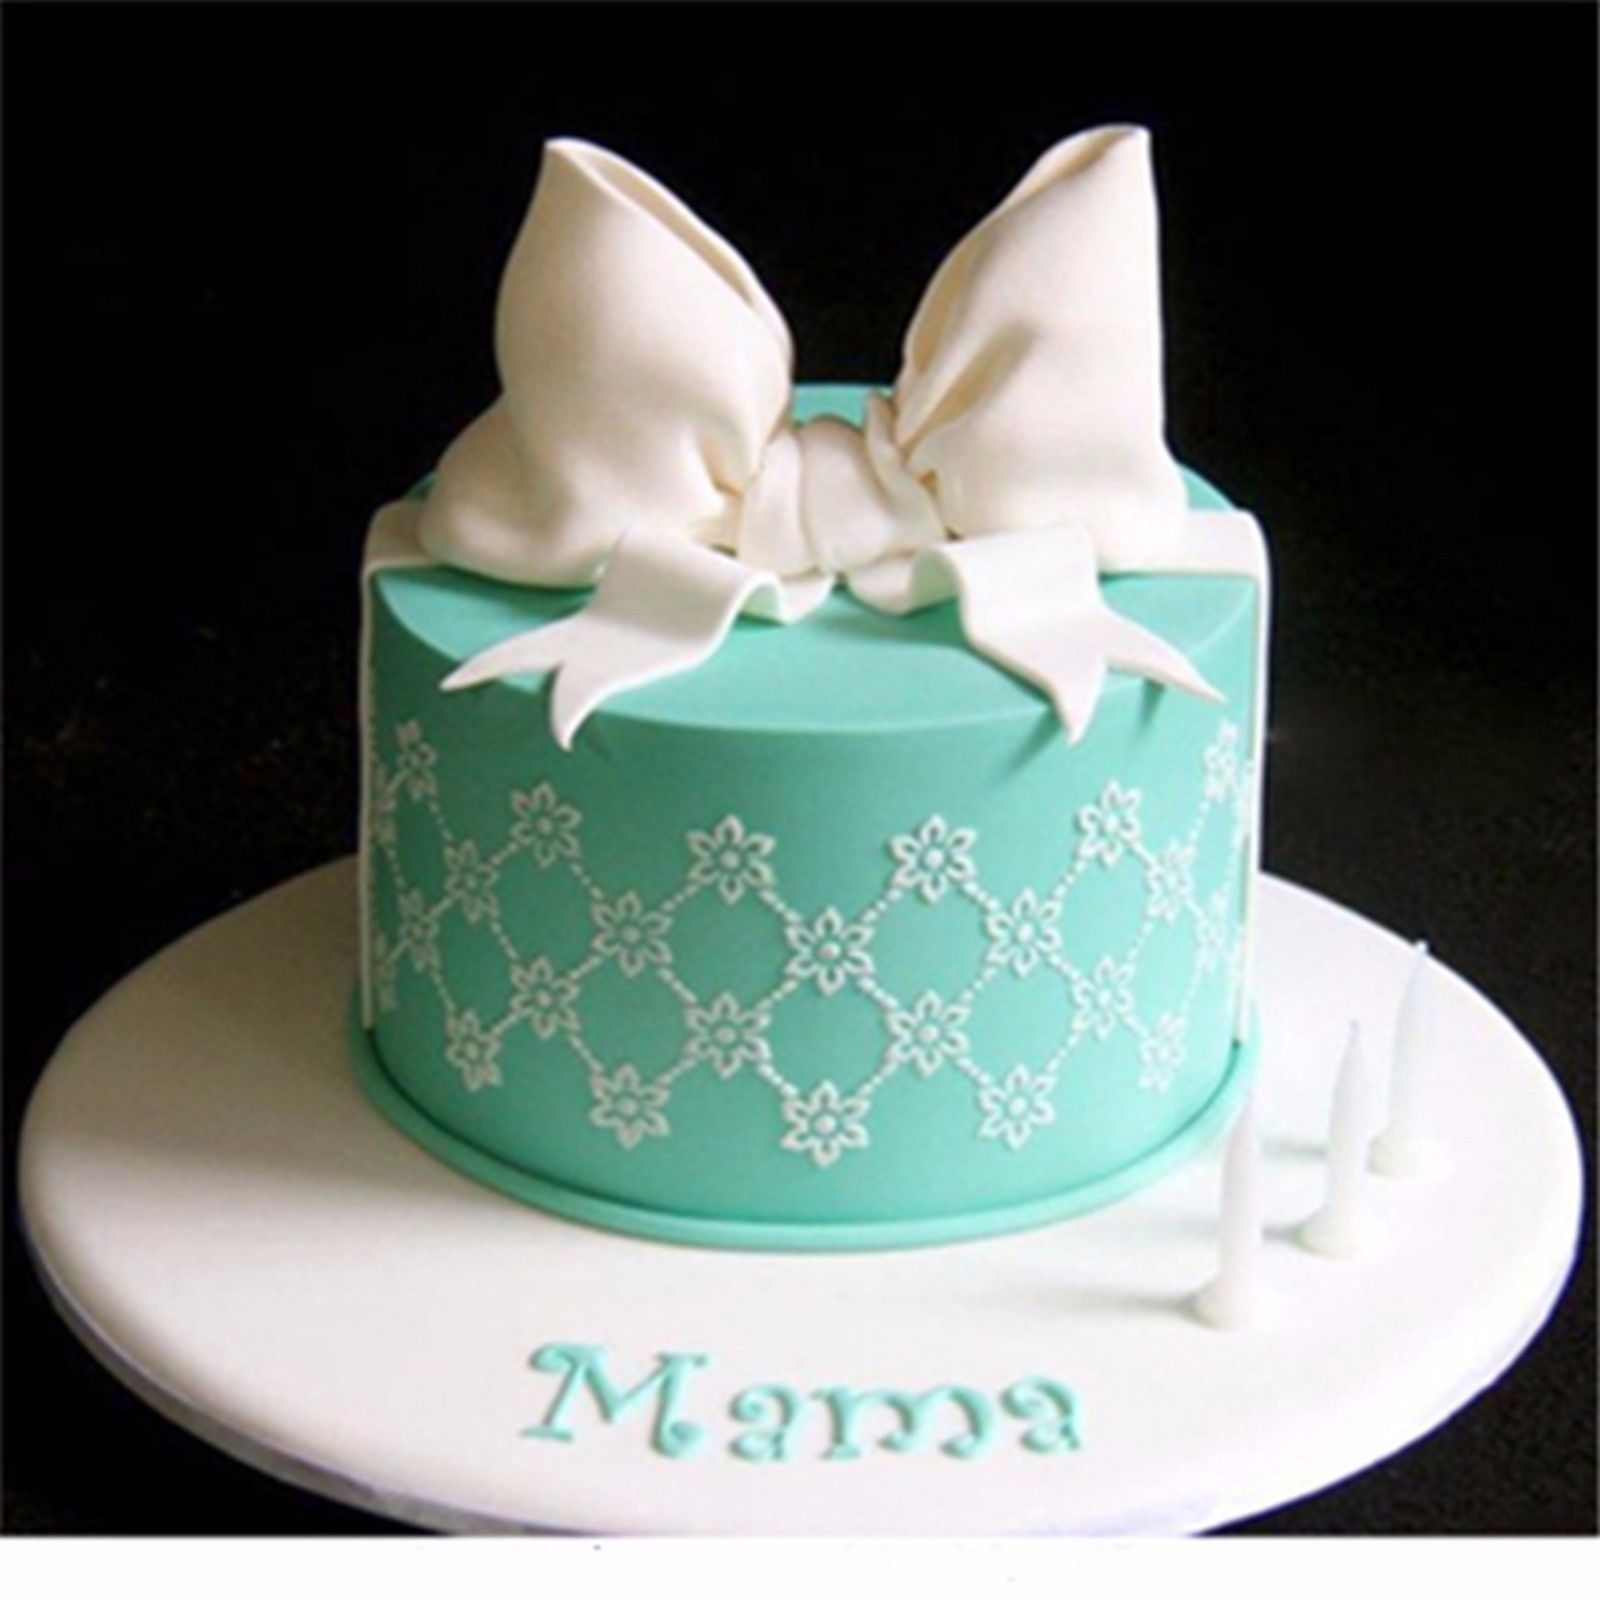 Mini Flowers Pattern Wedding Cake Stencil, Plantilla Para Tarta De ...